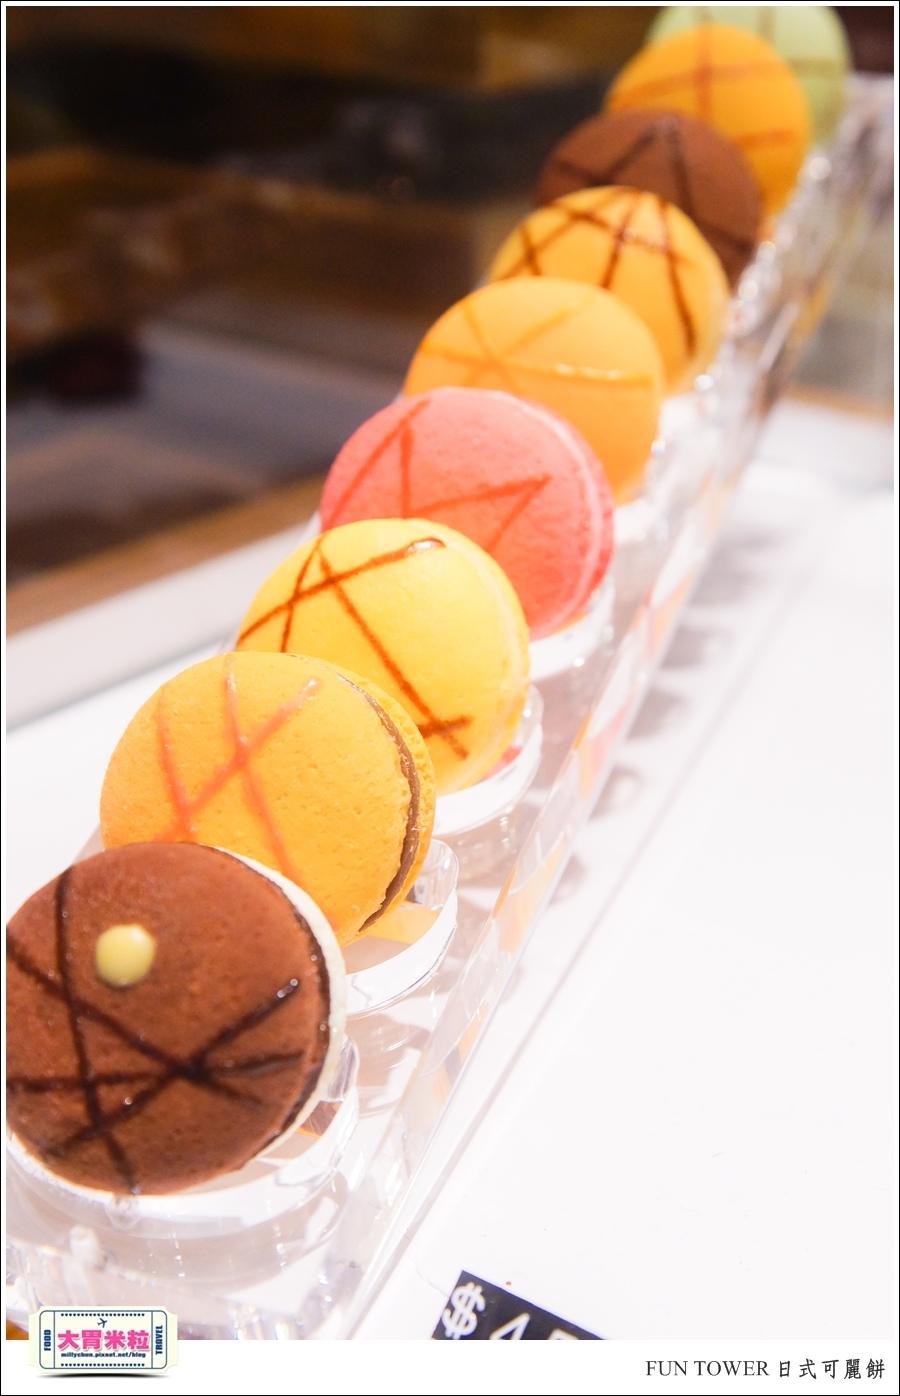 FUN TOWER日式可麗餅(高雄明華店)@高雄可麗餅甜點推薦@大胃米粒0016.jpg